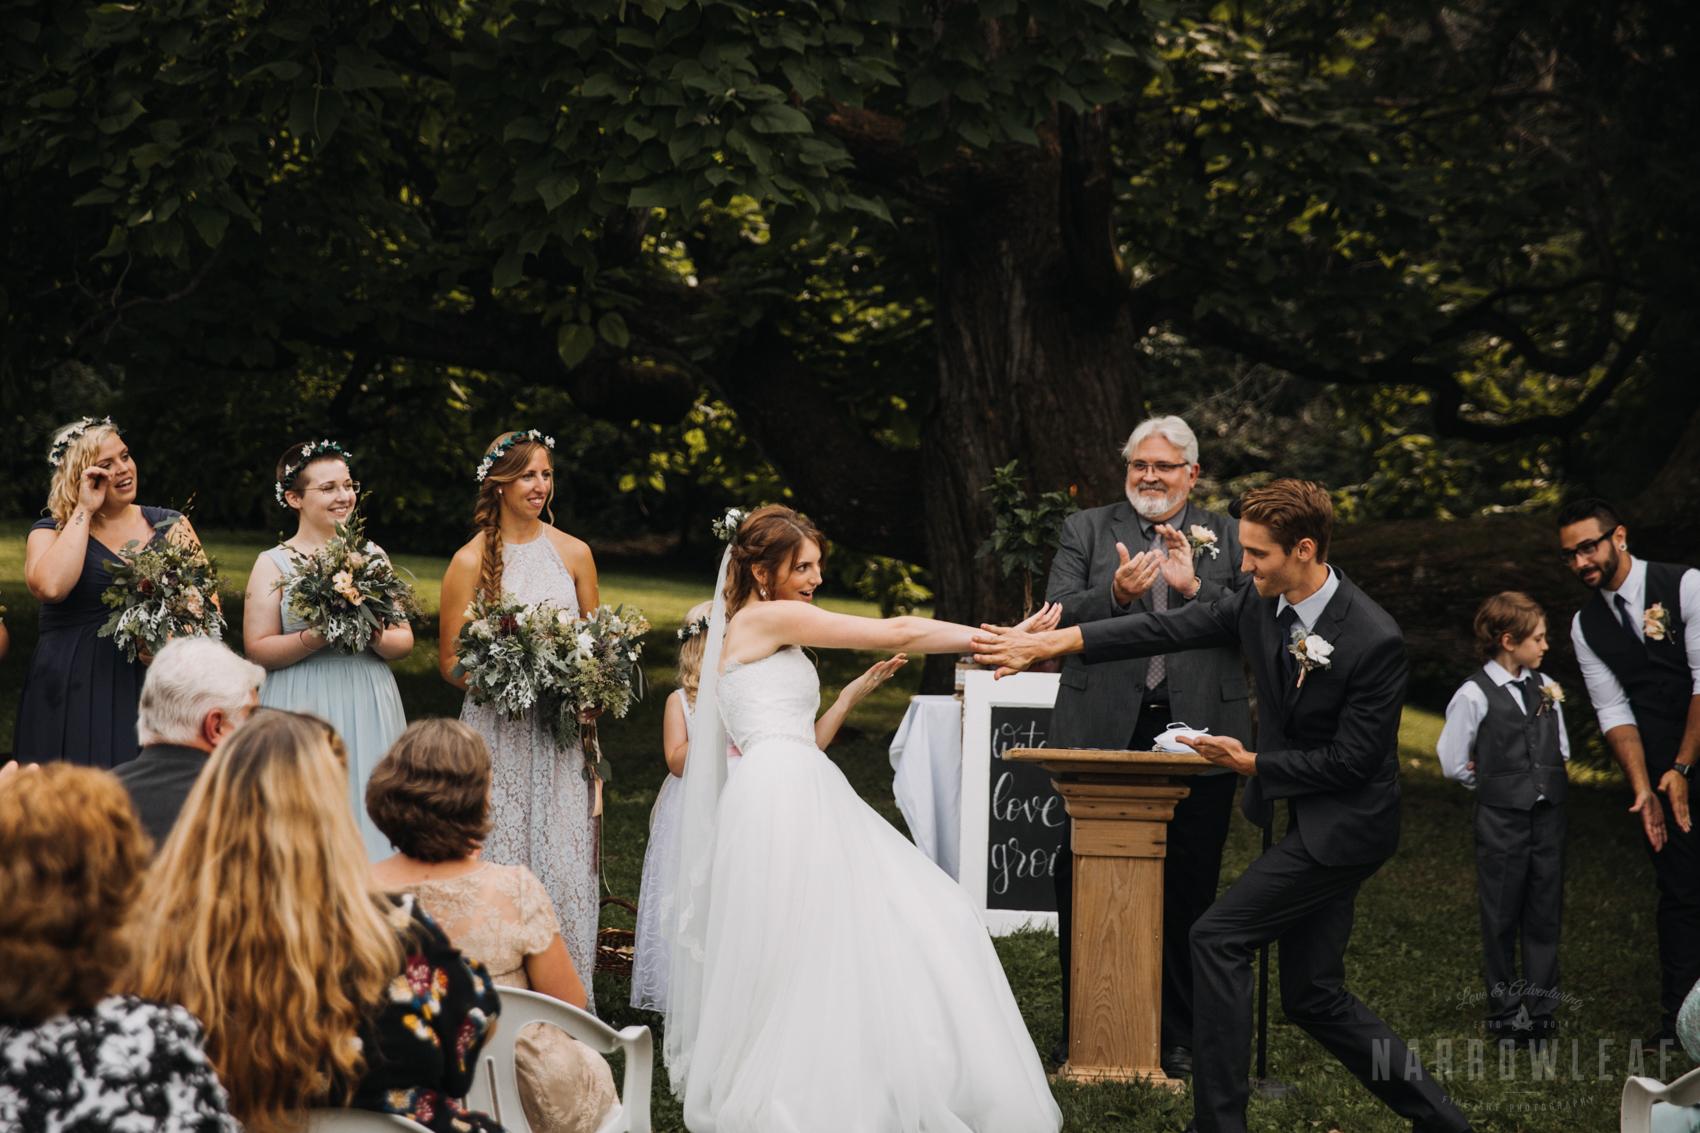 the-hilltop-wi-summer-outdoor-tree-wedding-314.jpg